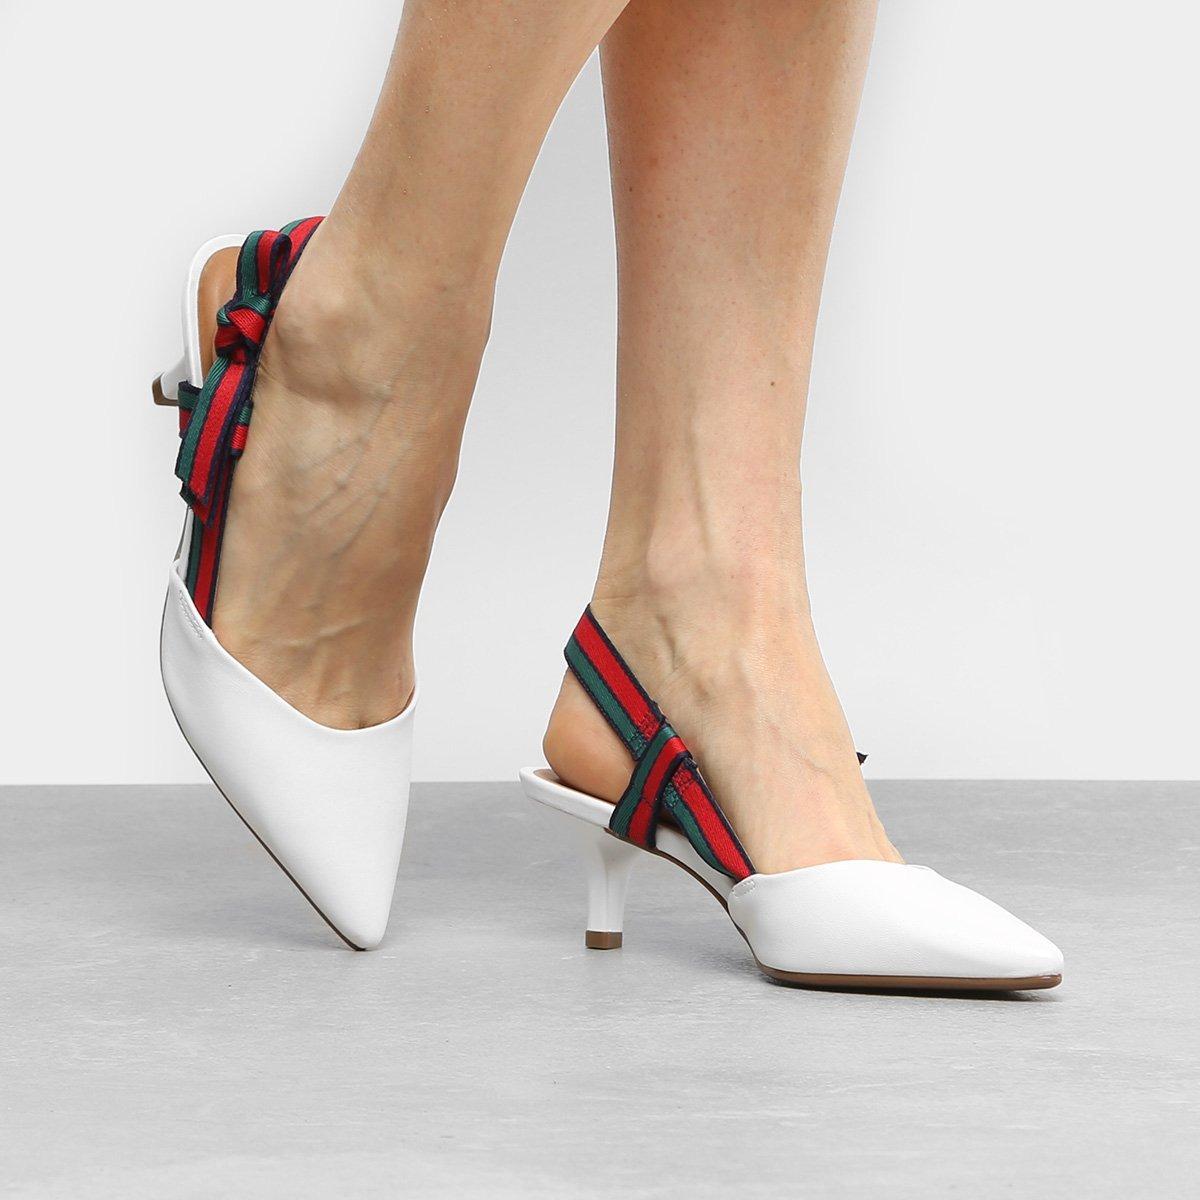 b080ba9d64 Sapato Scarpin Chanel Vizzano Salto Baixo Laço Gorgurão - R  120